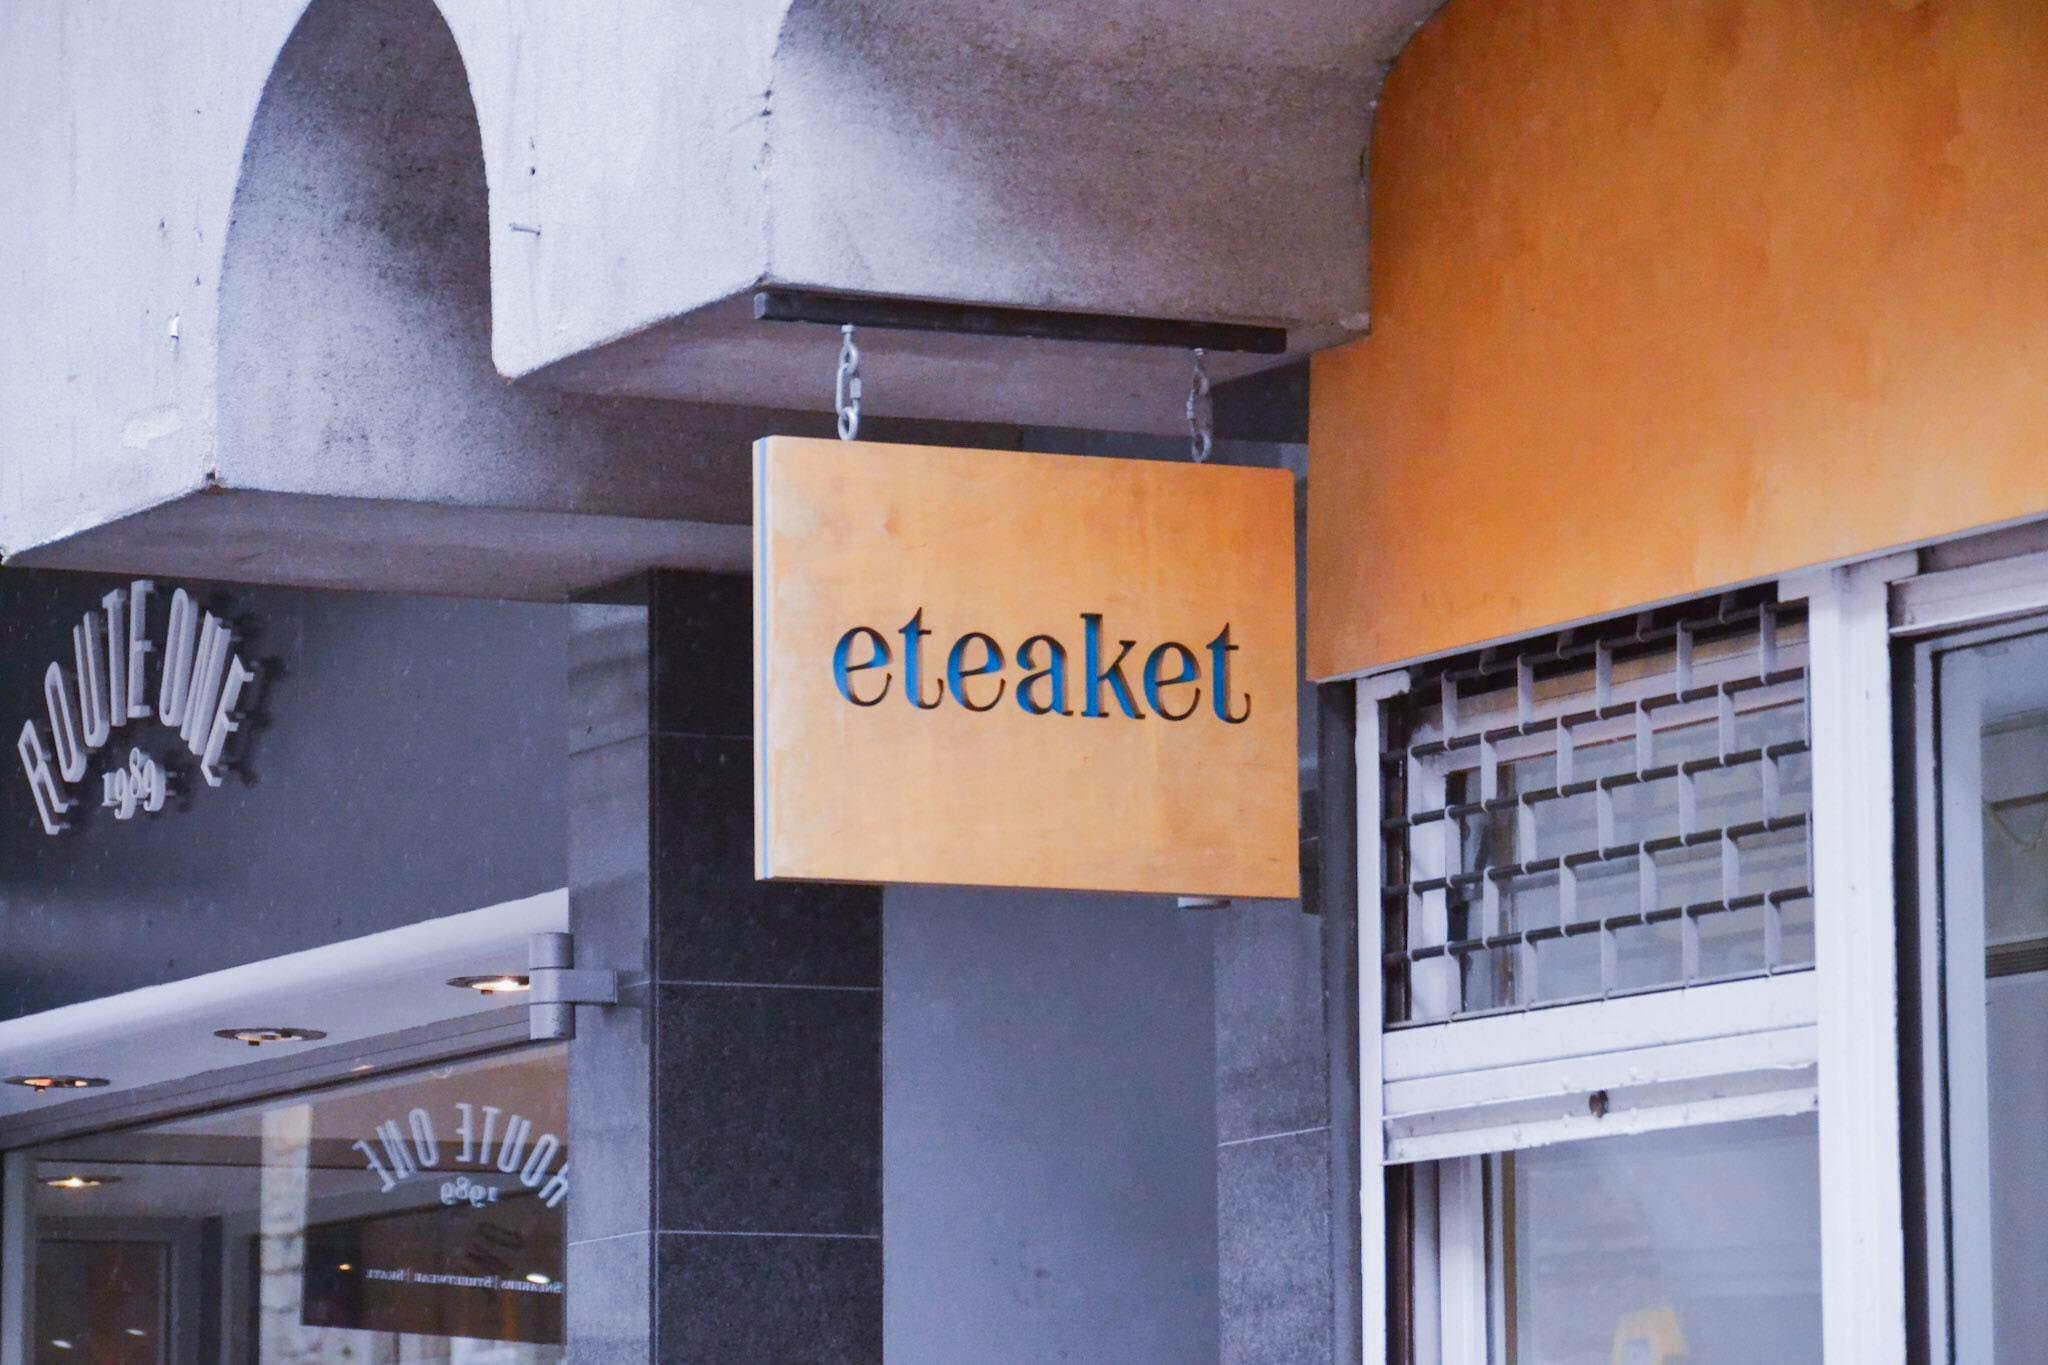 rose street-eteaket